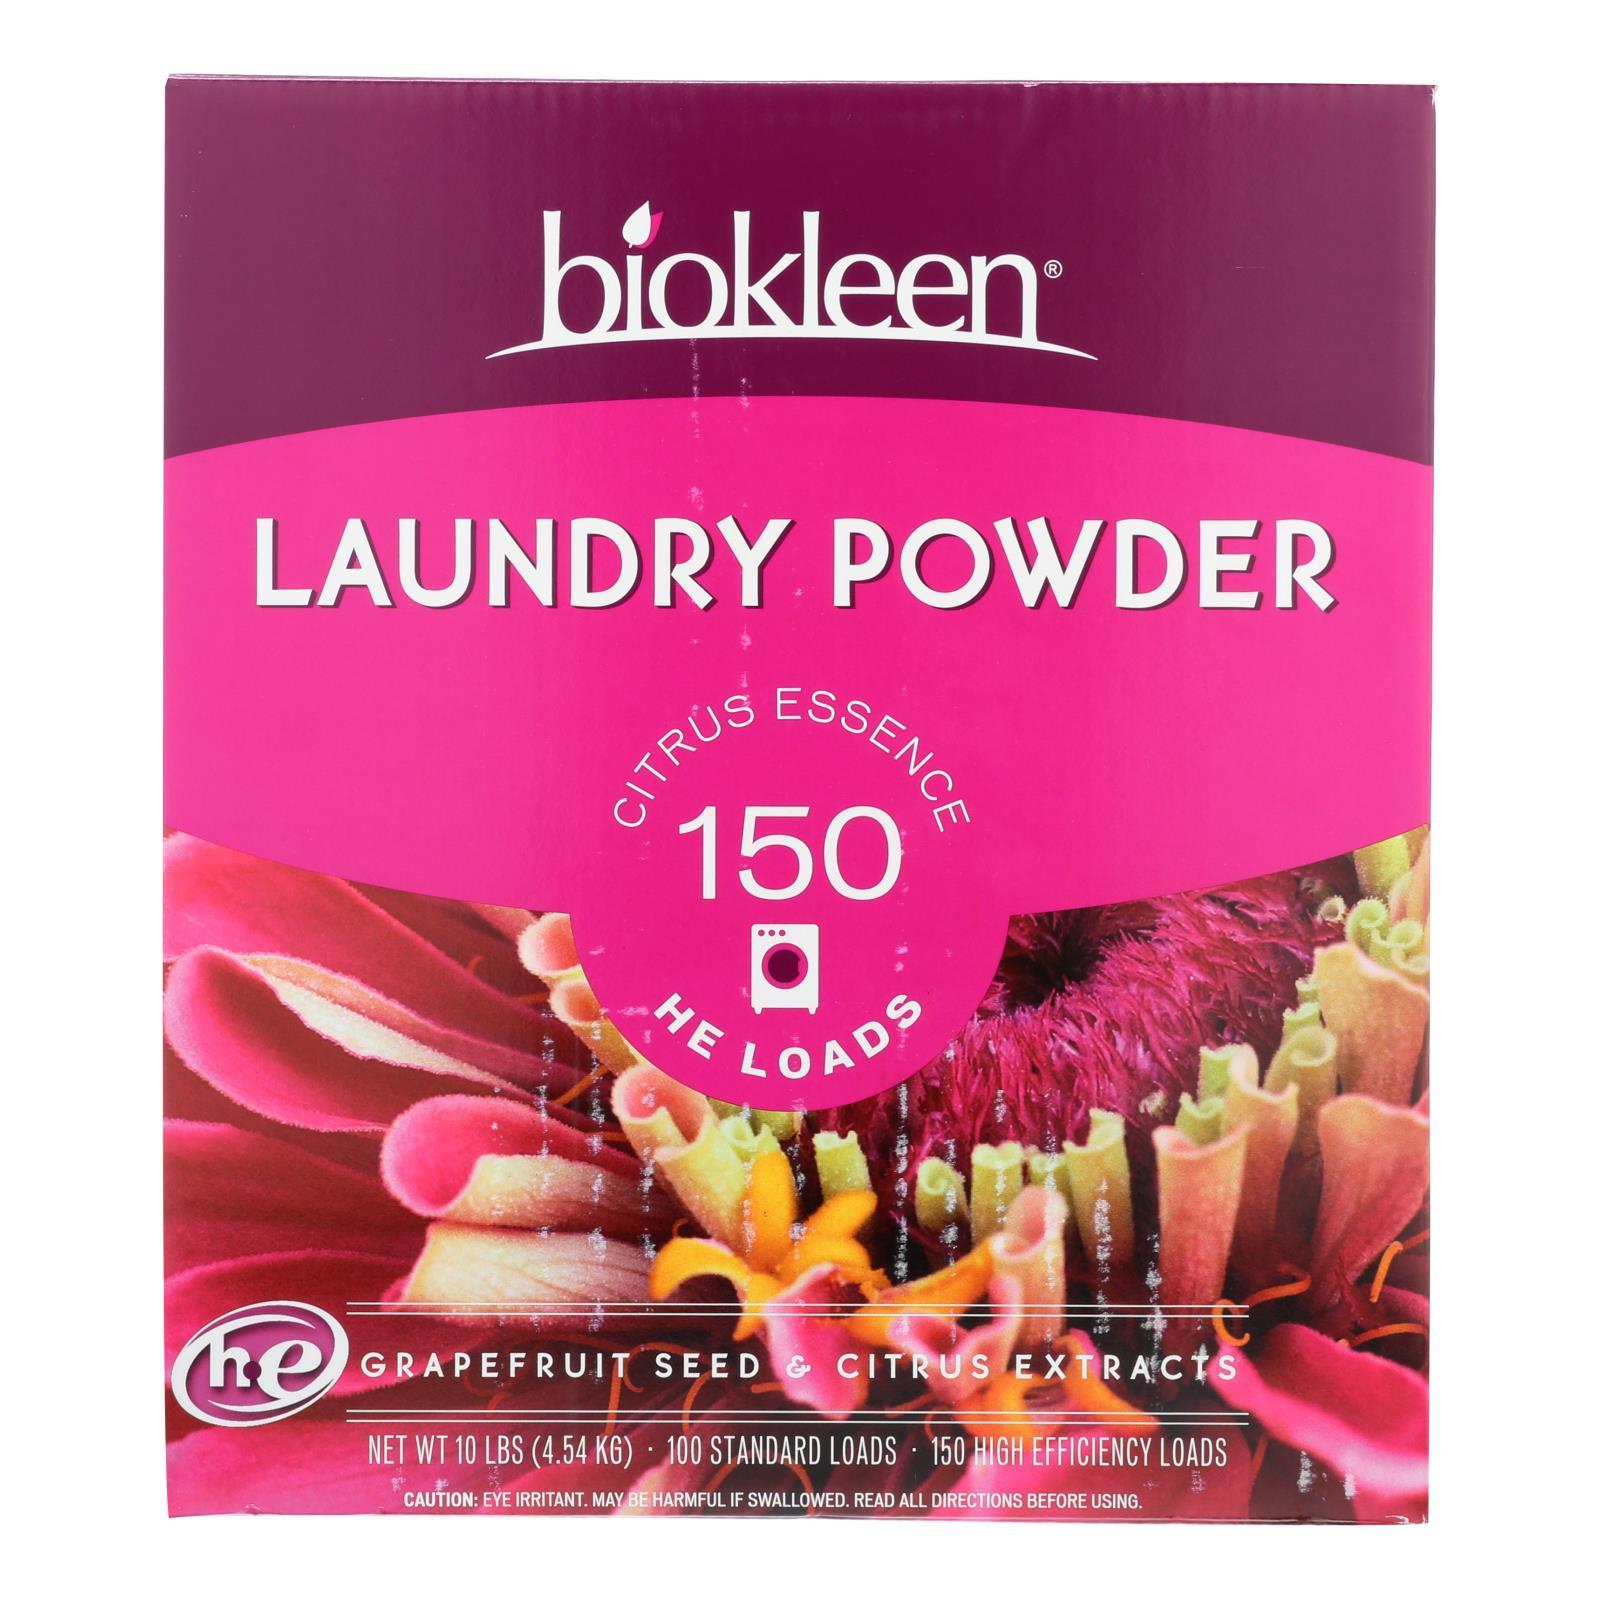 Biokleen Laundry Powder - Citrus Essence - 10 lb